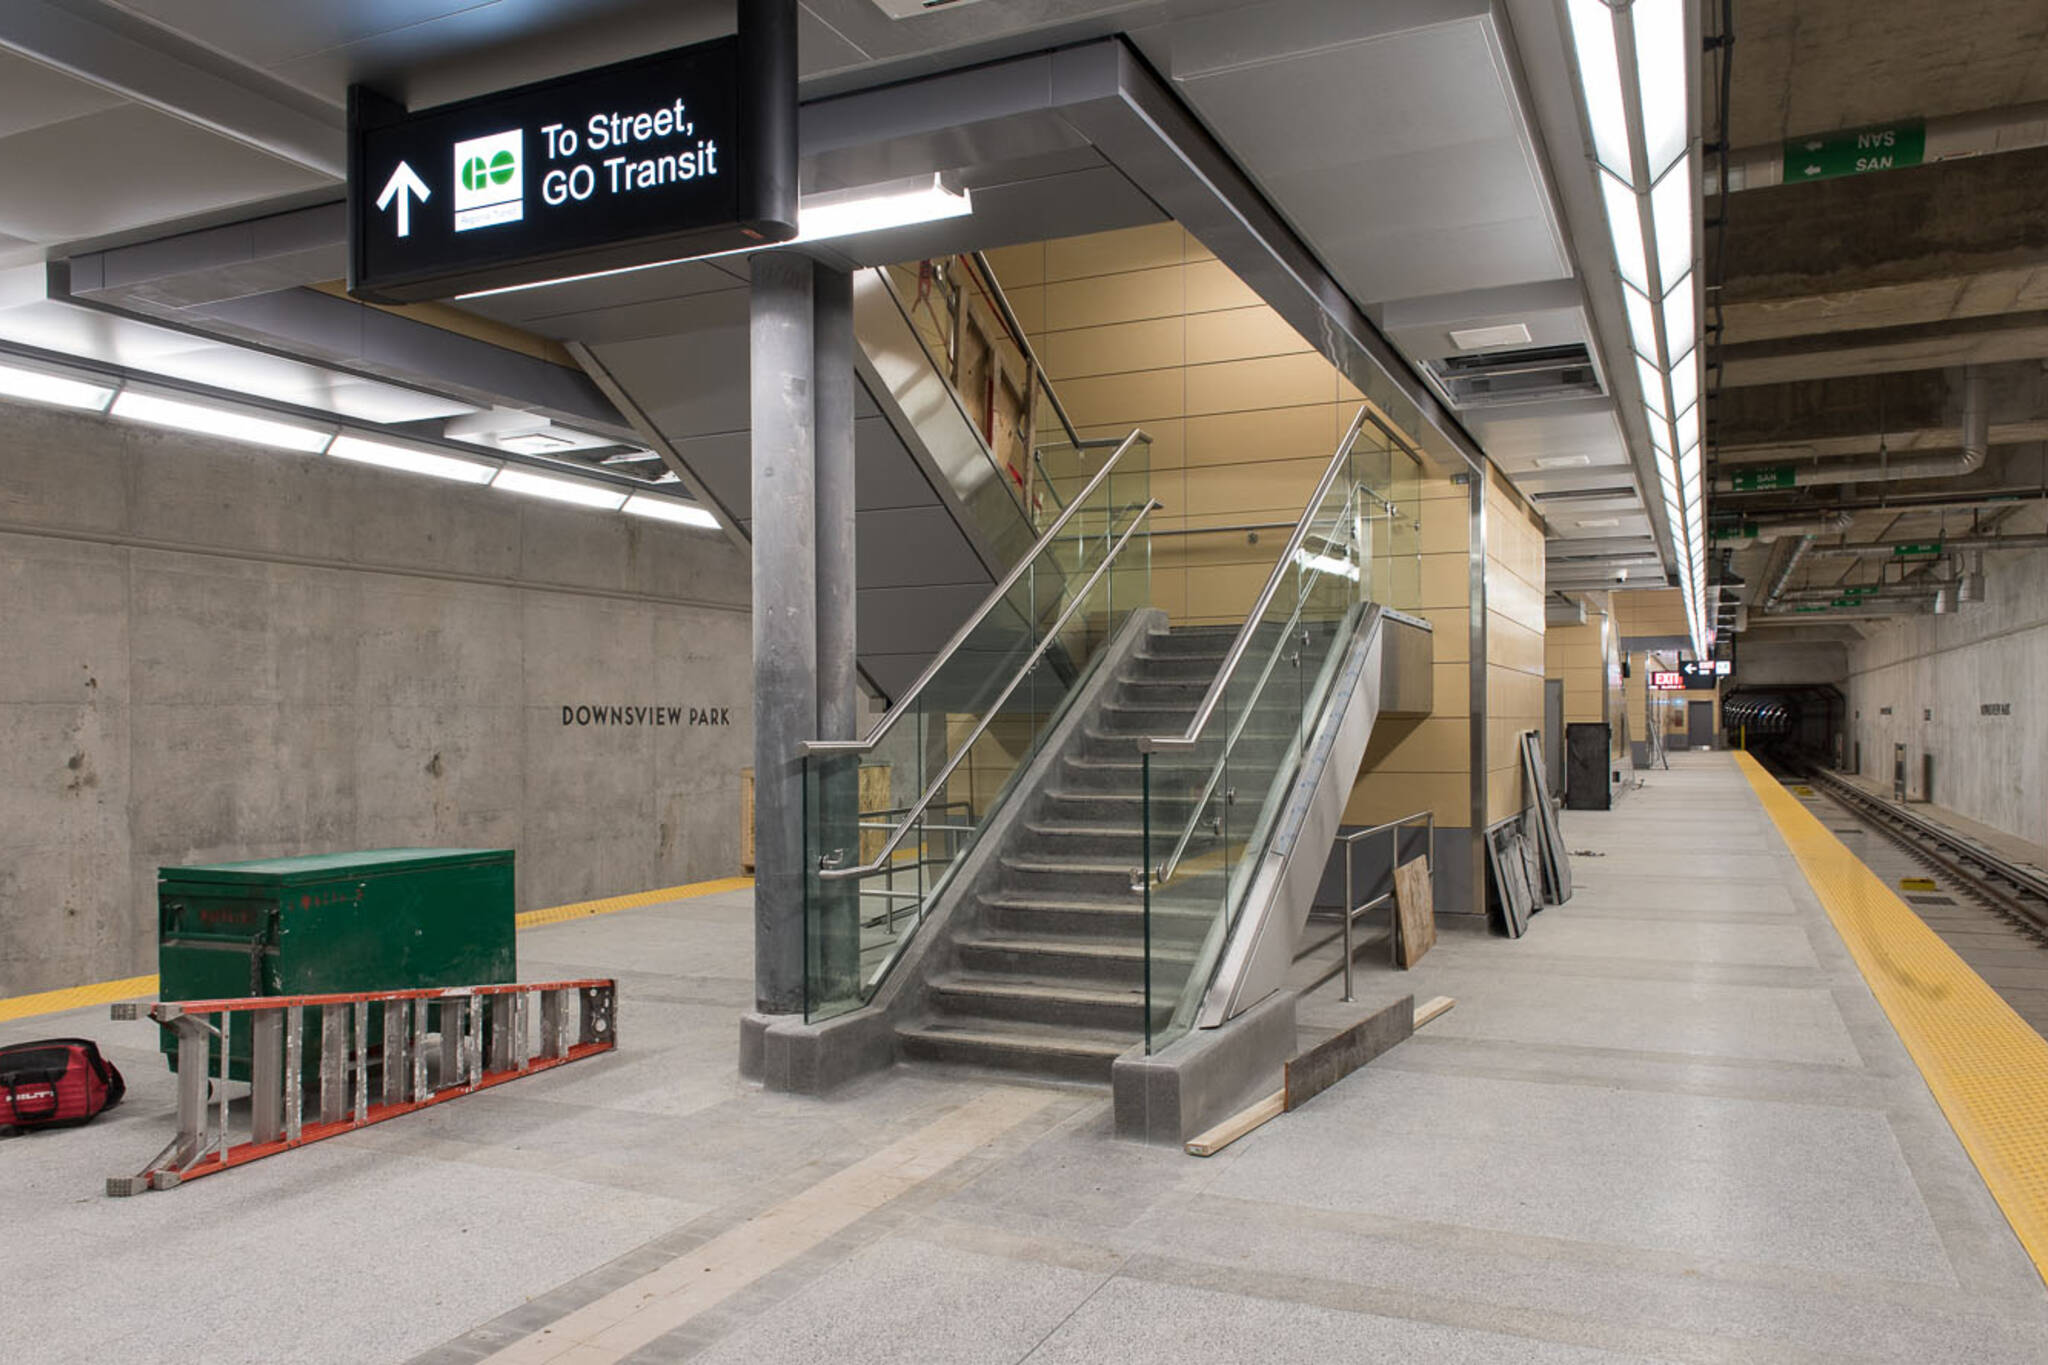 ttc subway station